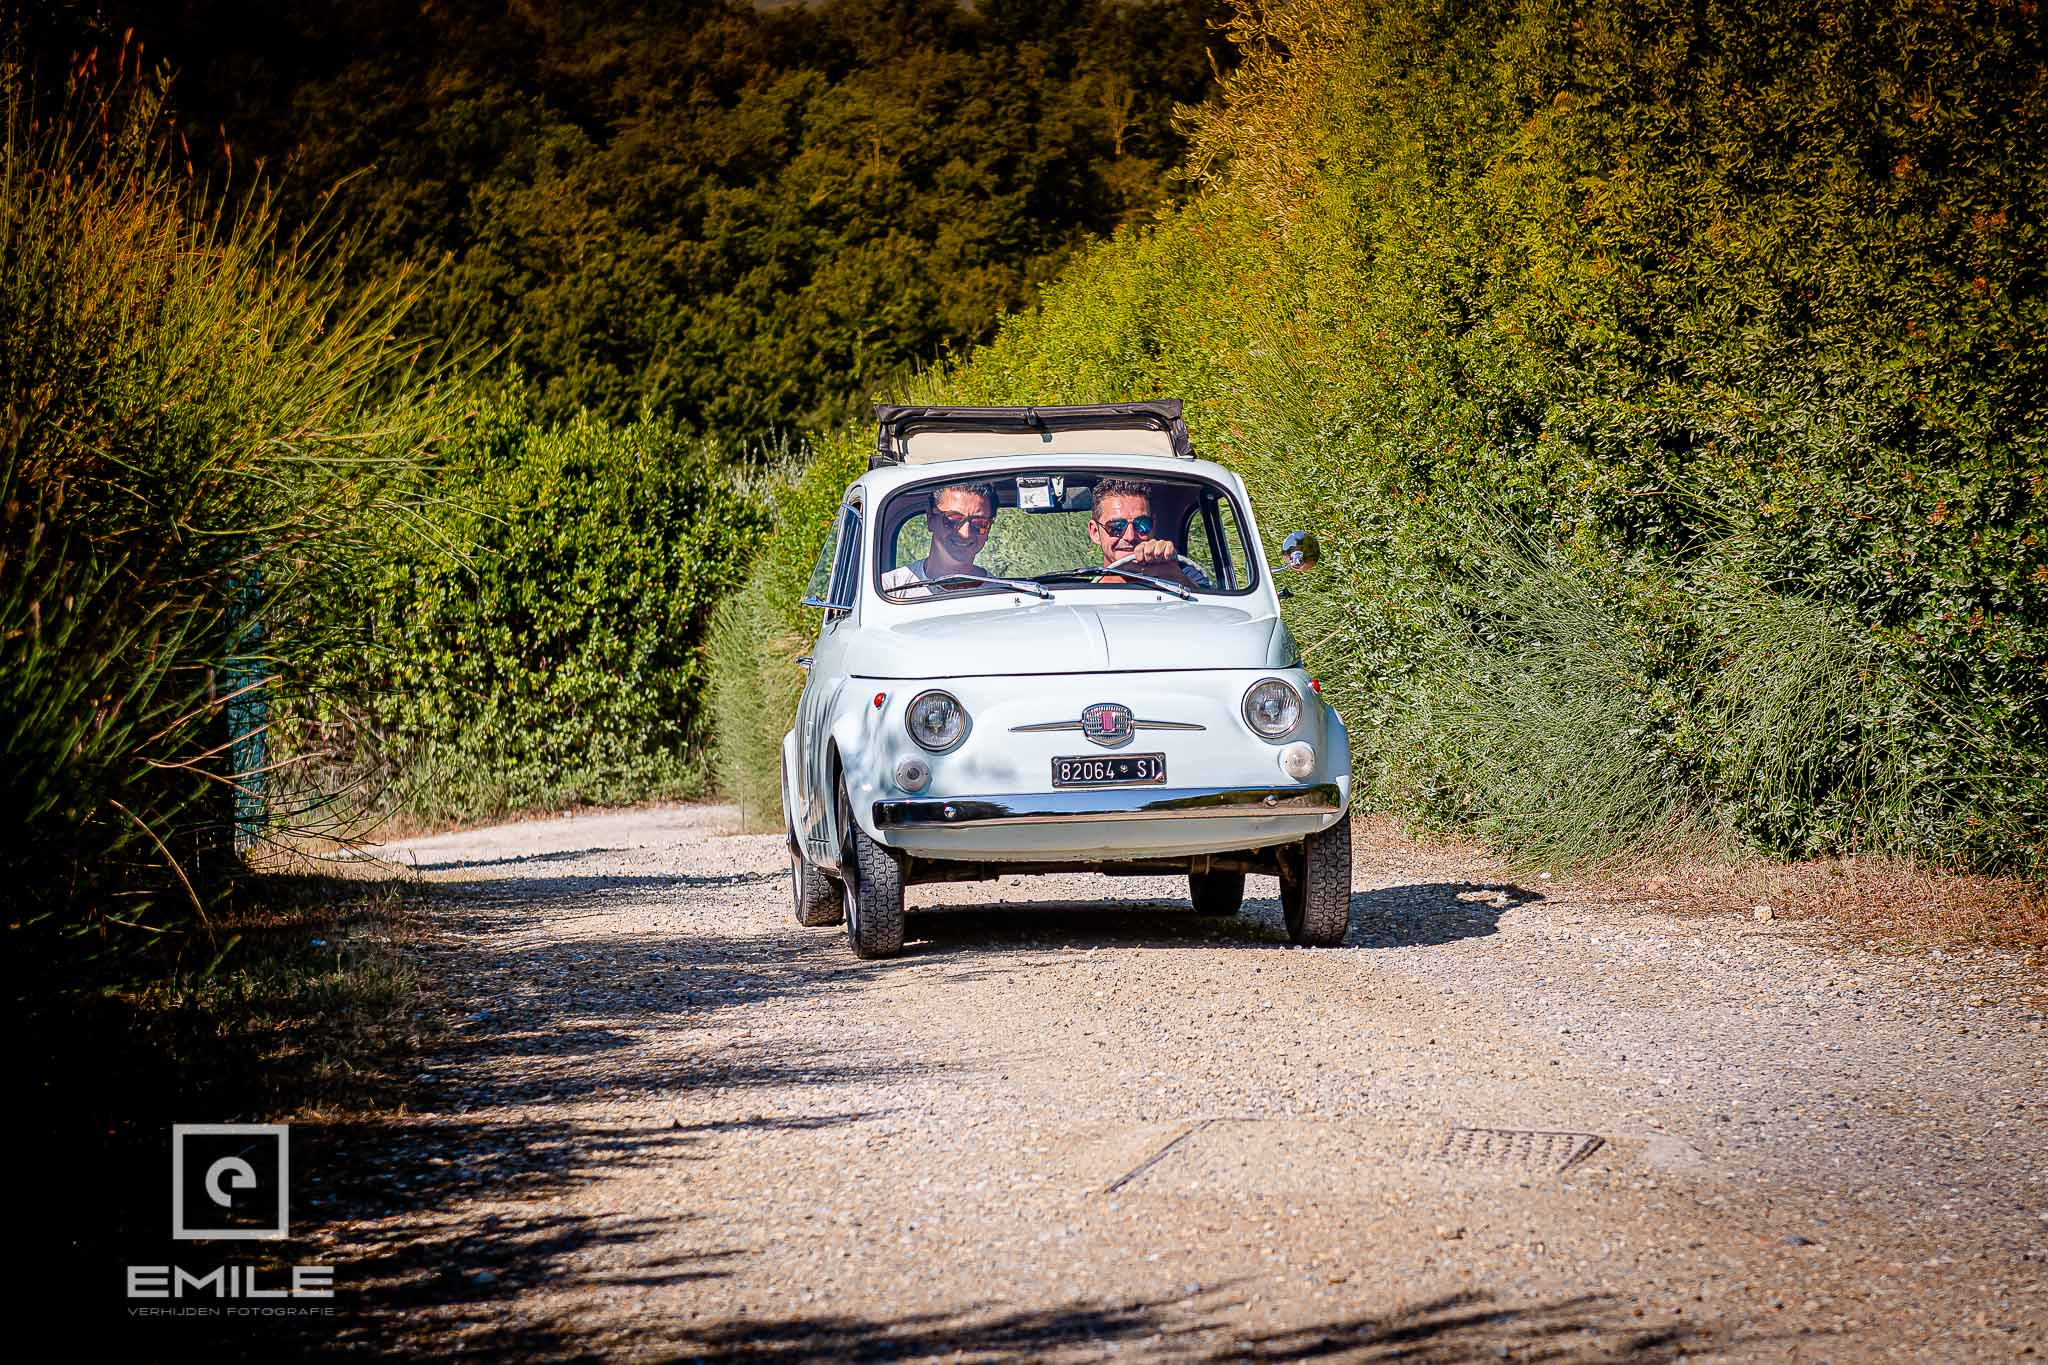 De FIAT 500 (Cinquecento) wordt opgehaald door de bruidegom - Destination wedding San Gimignano - Toscane Italie - Iris en Job